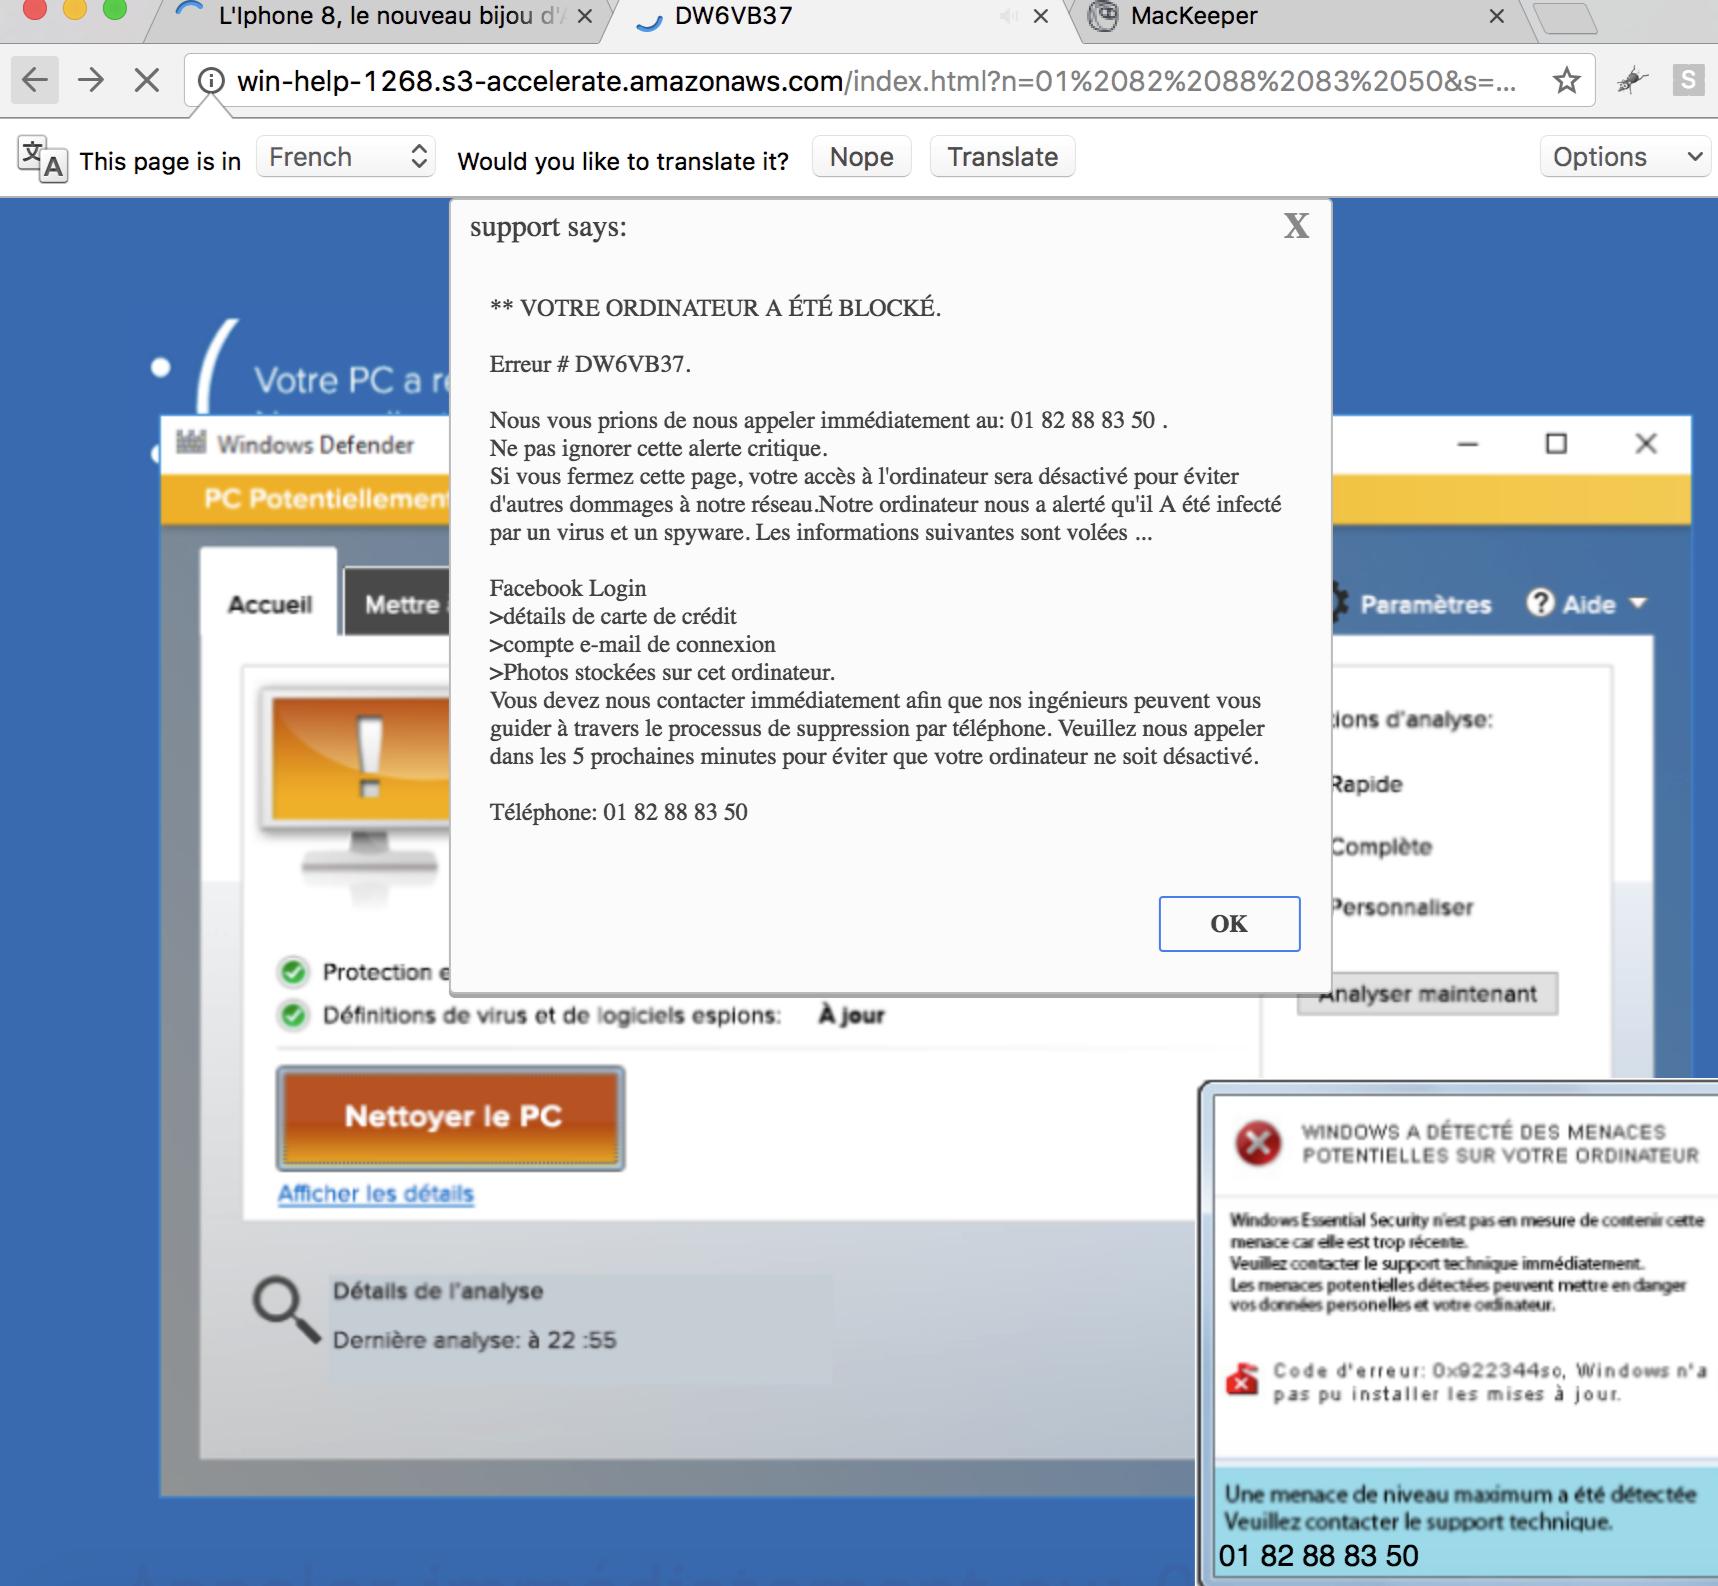 Win-help-1268.s3-accelerate.amazonaws.com scam